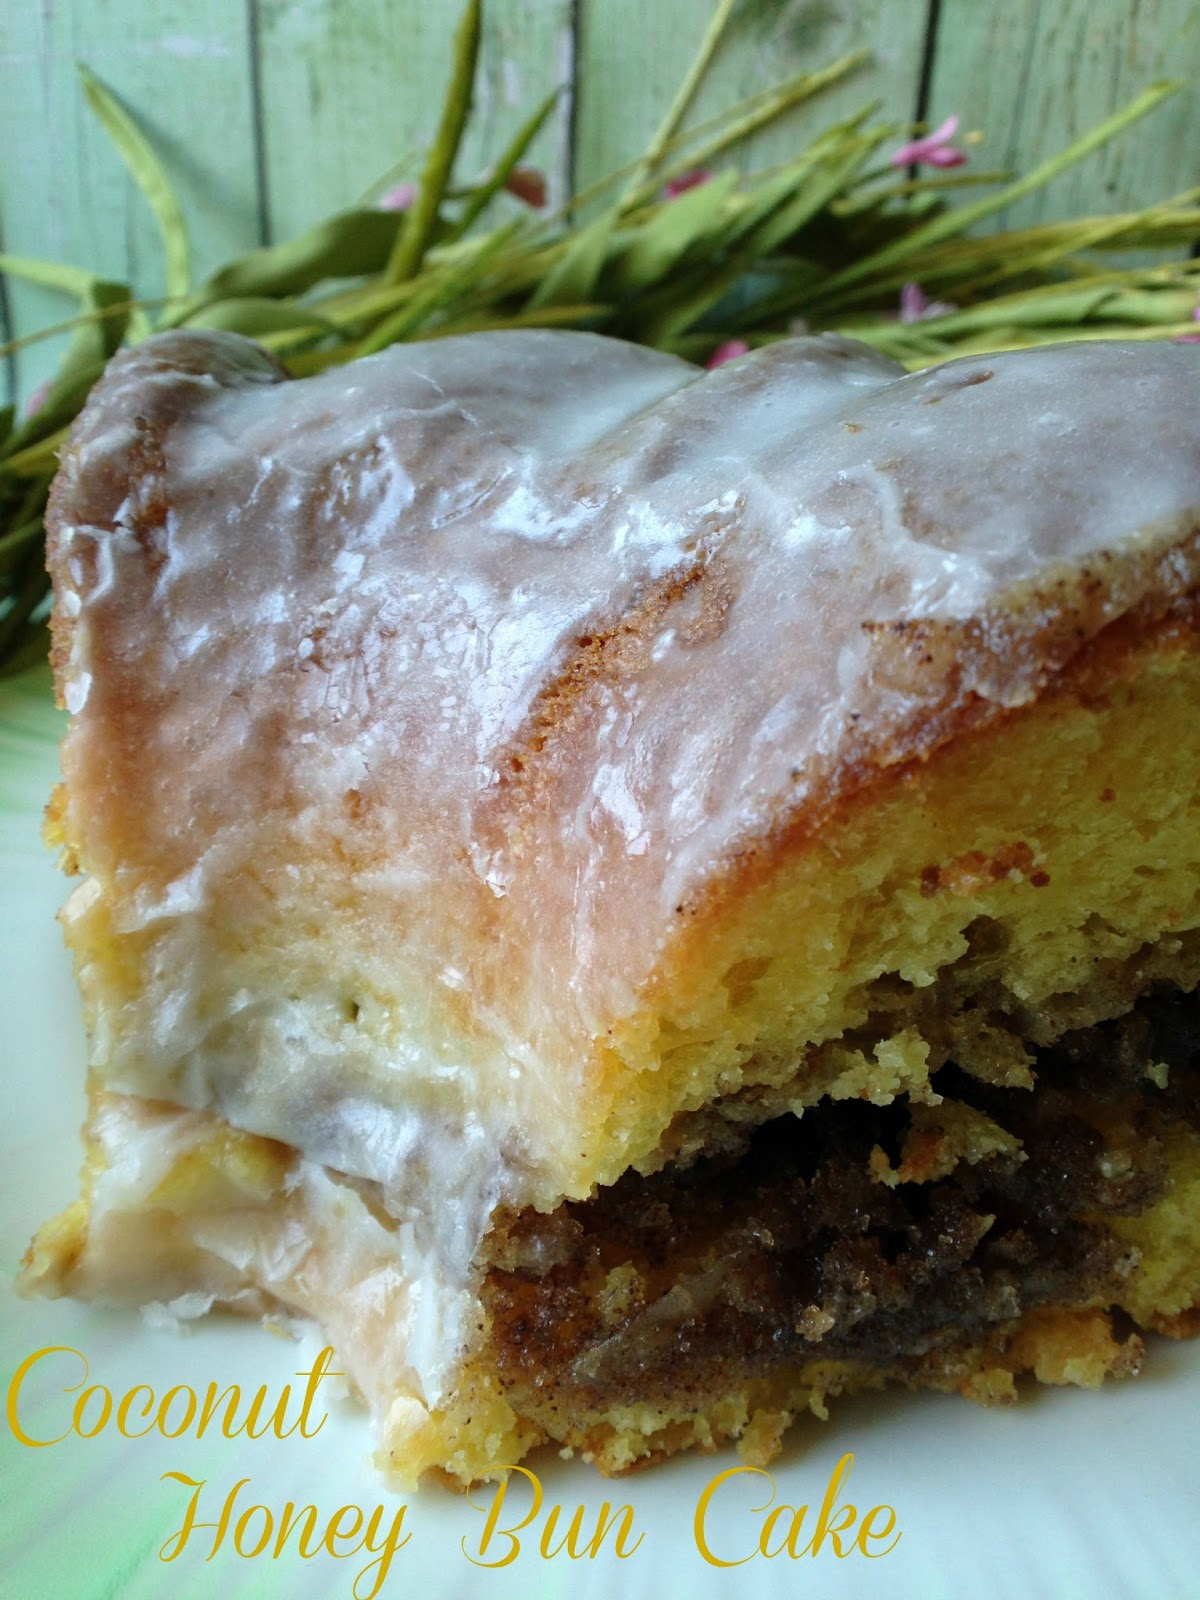 Honey Bun Cake Recipe Without Pecans